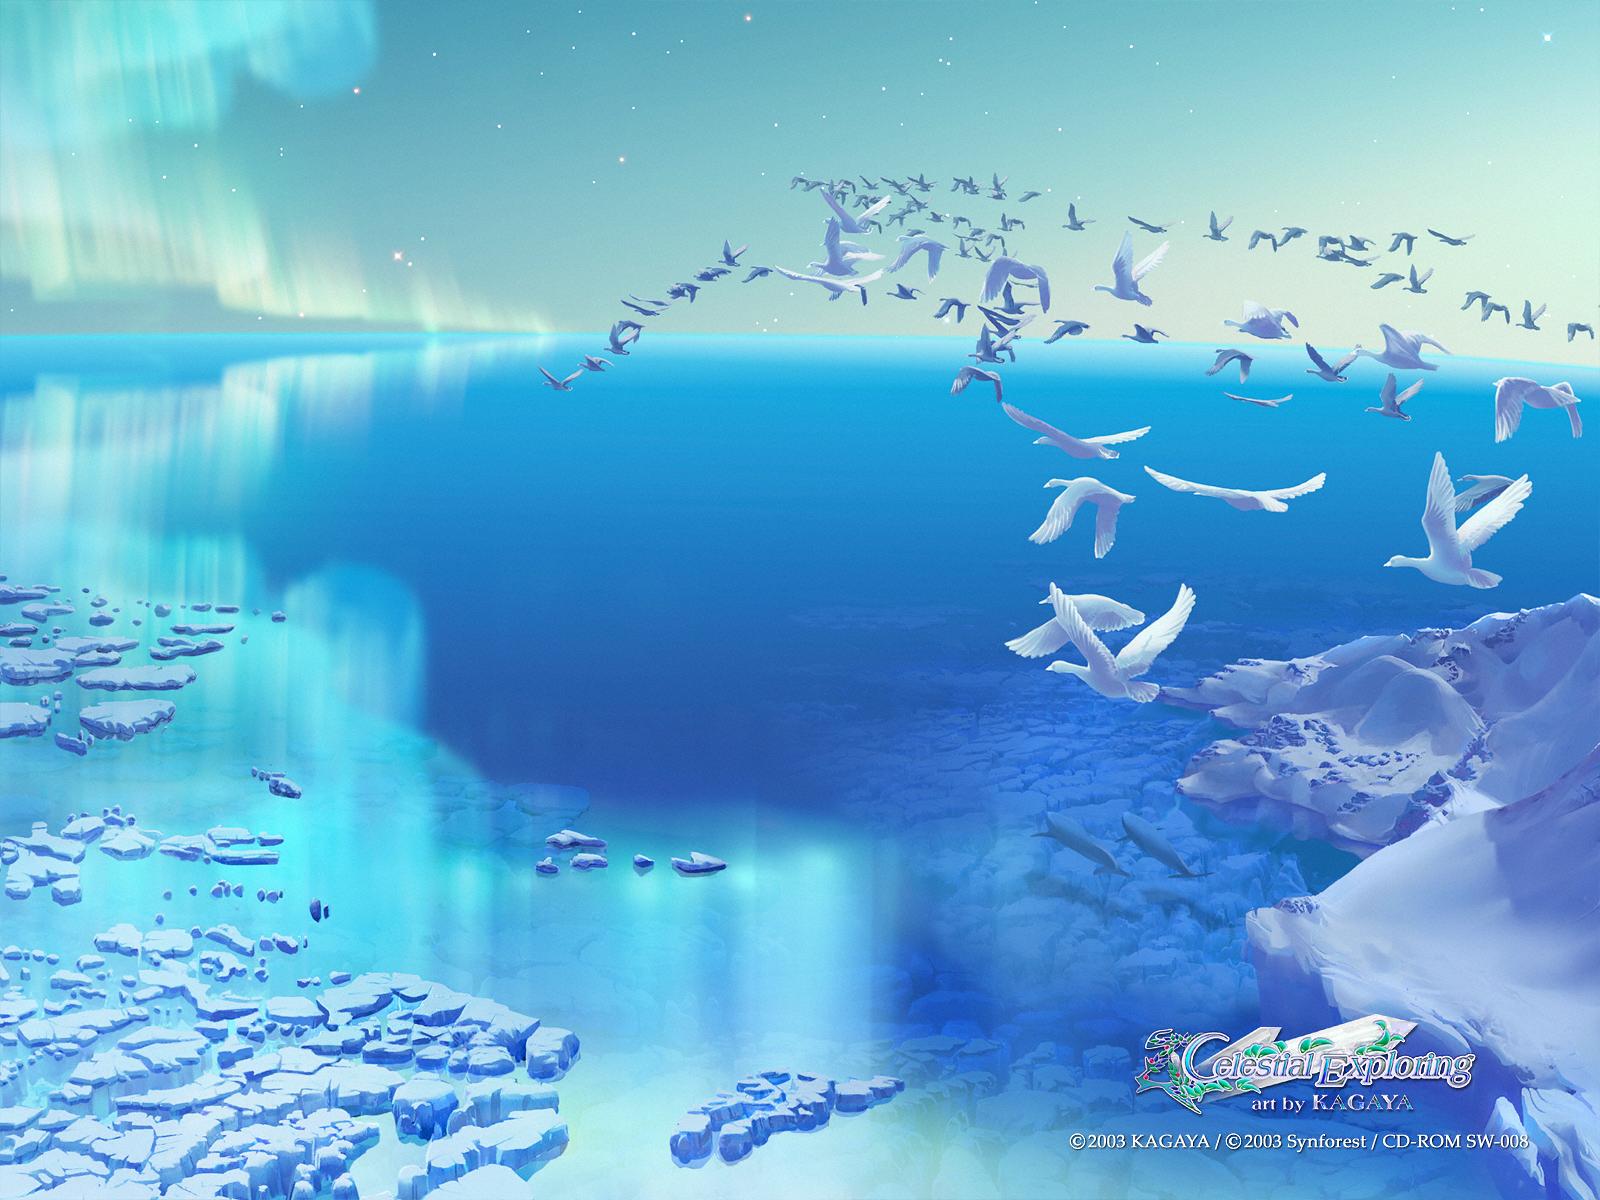 Kagaya Fantasy Art, Kagaya Celestial Exploring Paintings, Kagaya ...